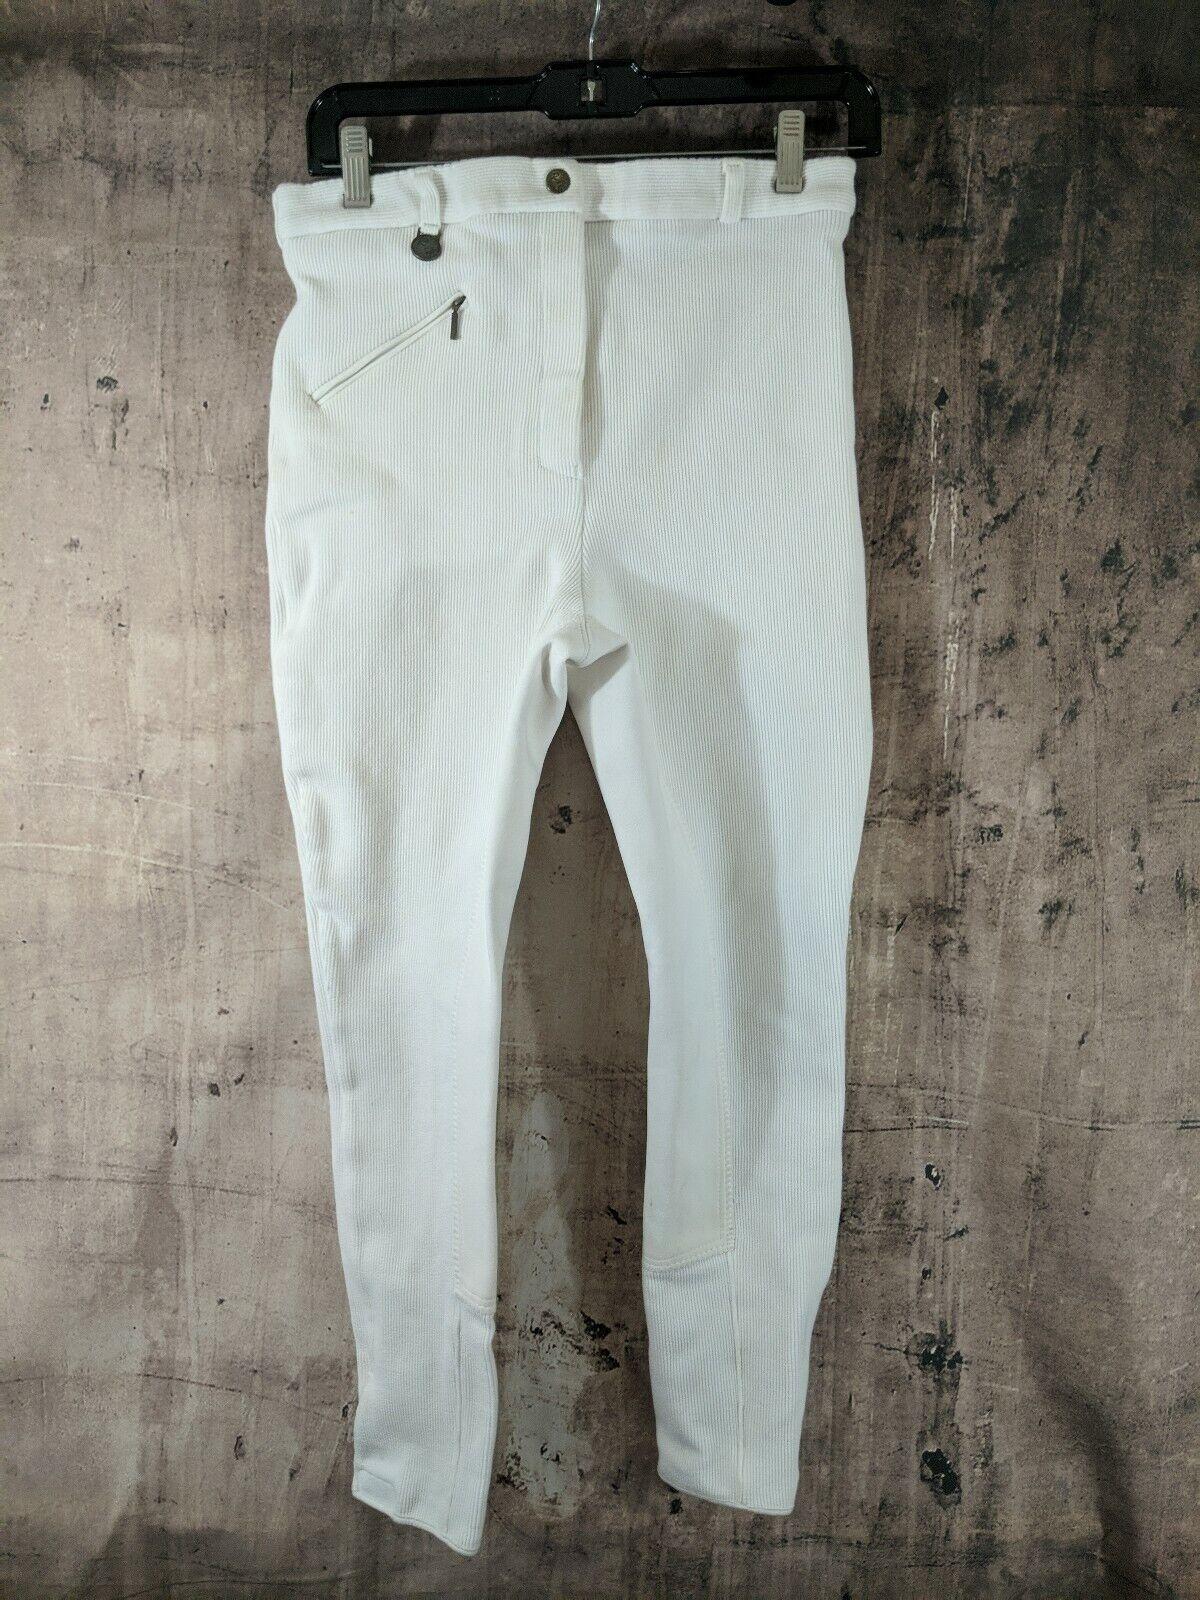 Royal Highness English Riding Pants Size 30R White B25